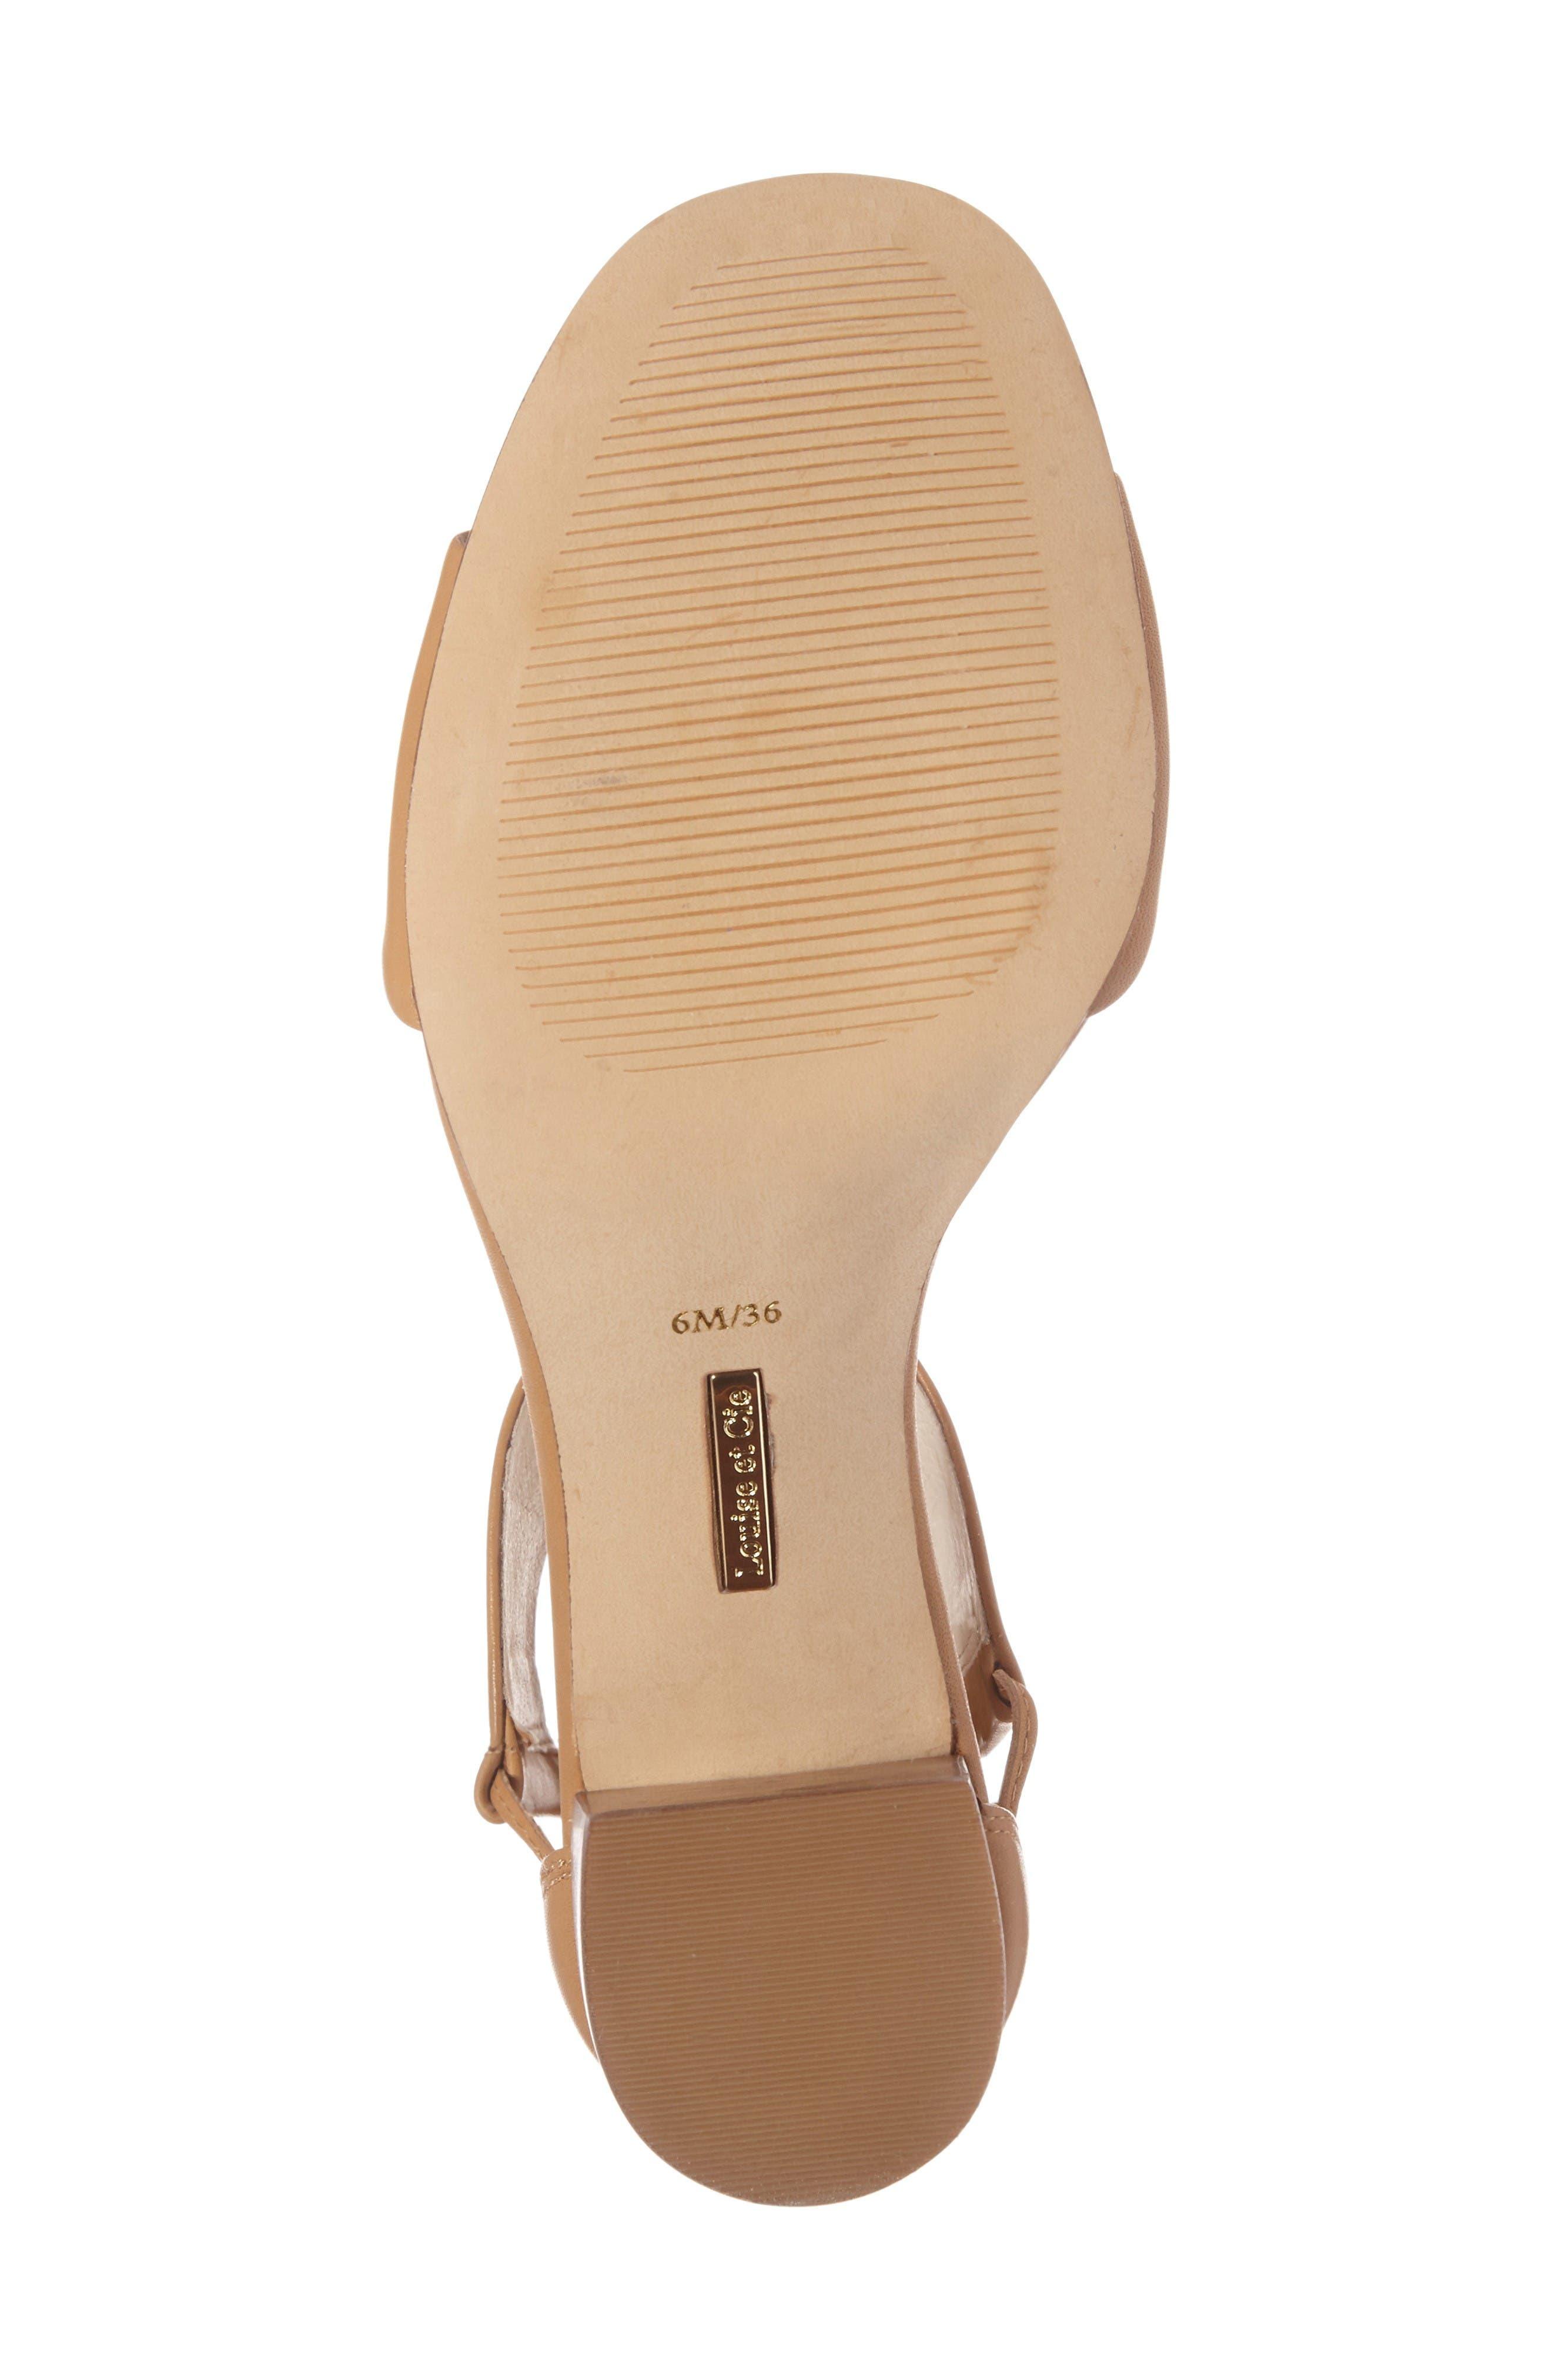 Keegan Block Heel Sandal,                             Alternate thumbnail 4, color,                             True Tan Leather